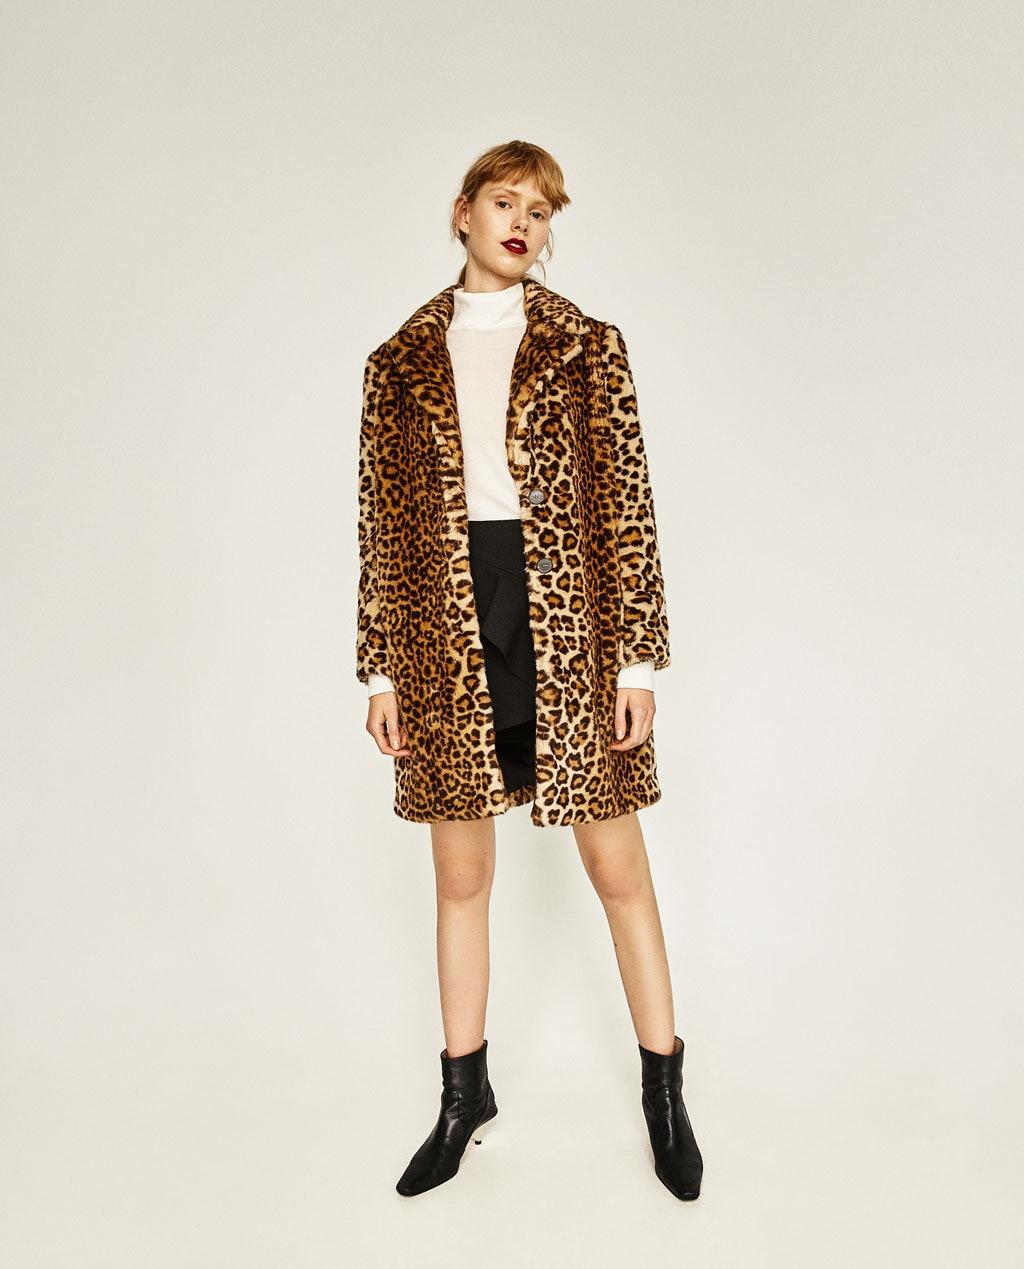 6123e0c0c79f Cheetah Print Faux Fur Coat Gap Leopard 3 4 Sleeves